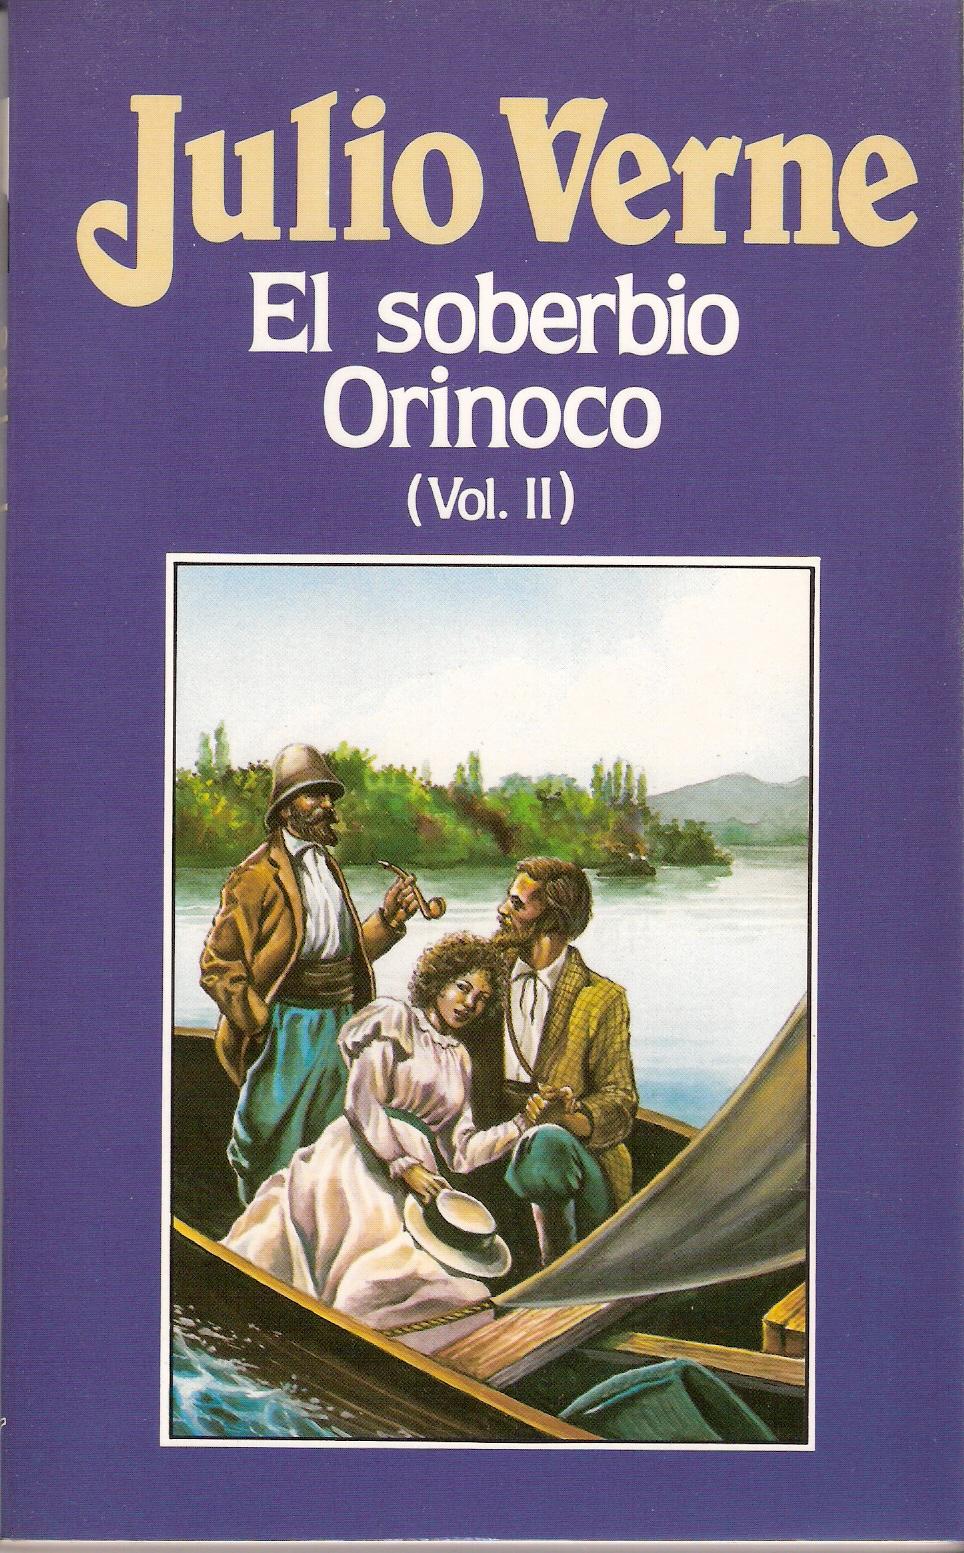 El soberbio Orinoco II